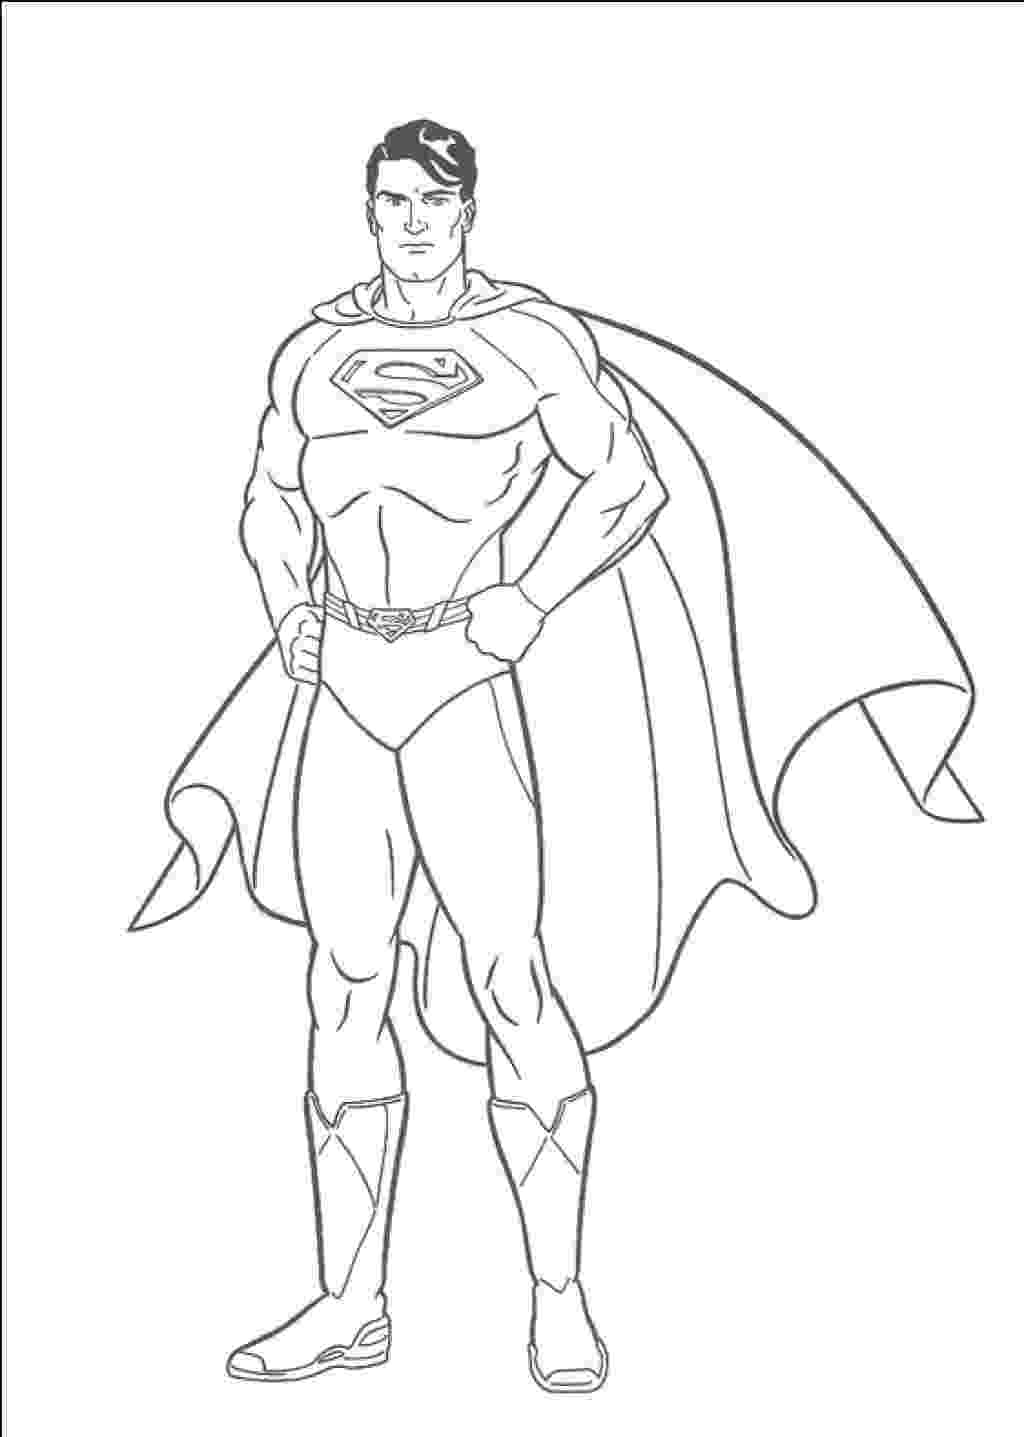 superman coloring sheet free superman coloring pages for boys kids coloring pages sheet superman coloring